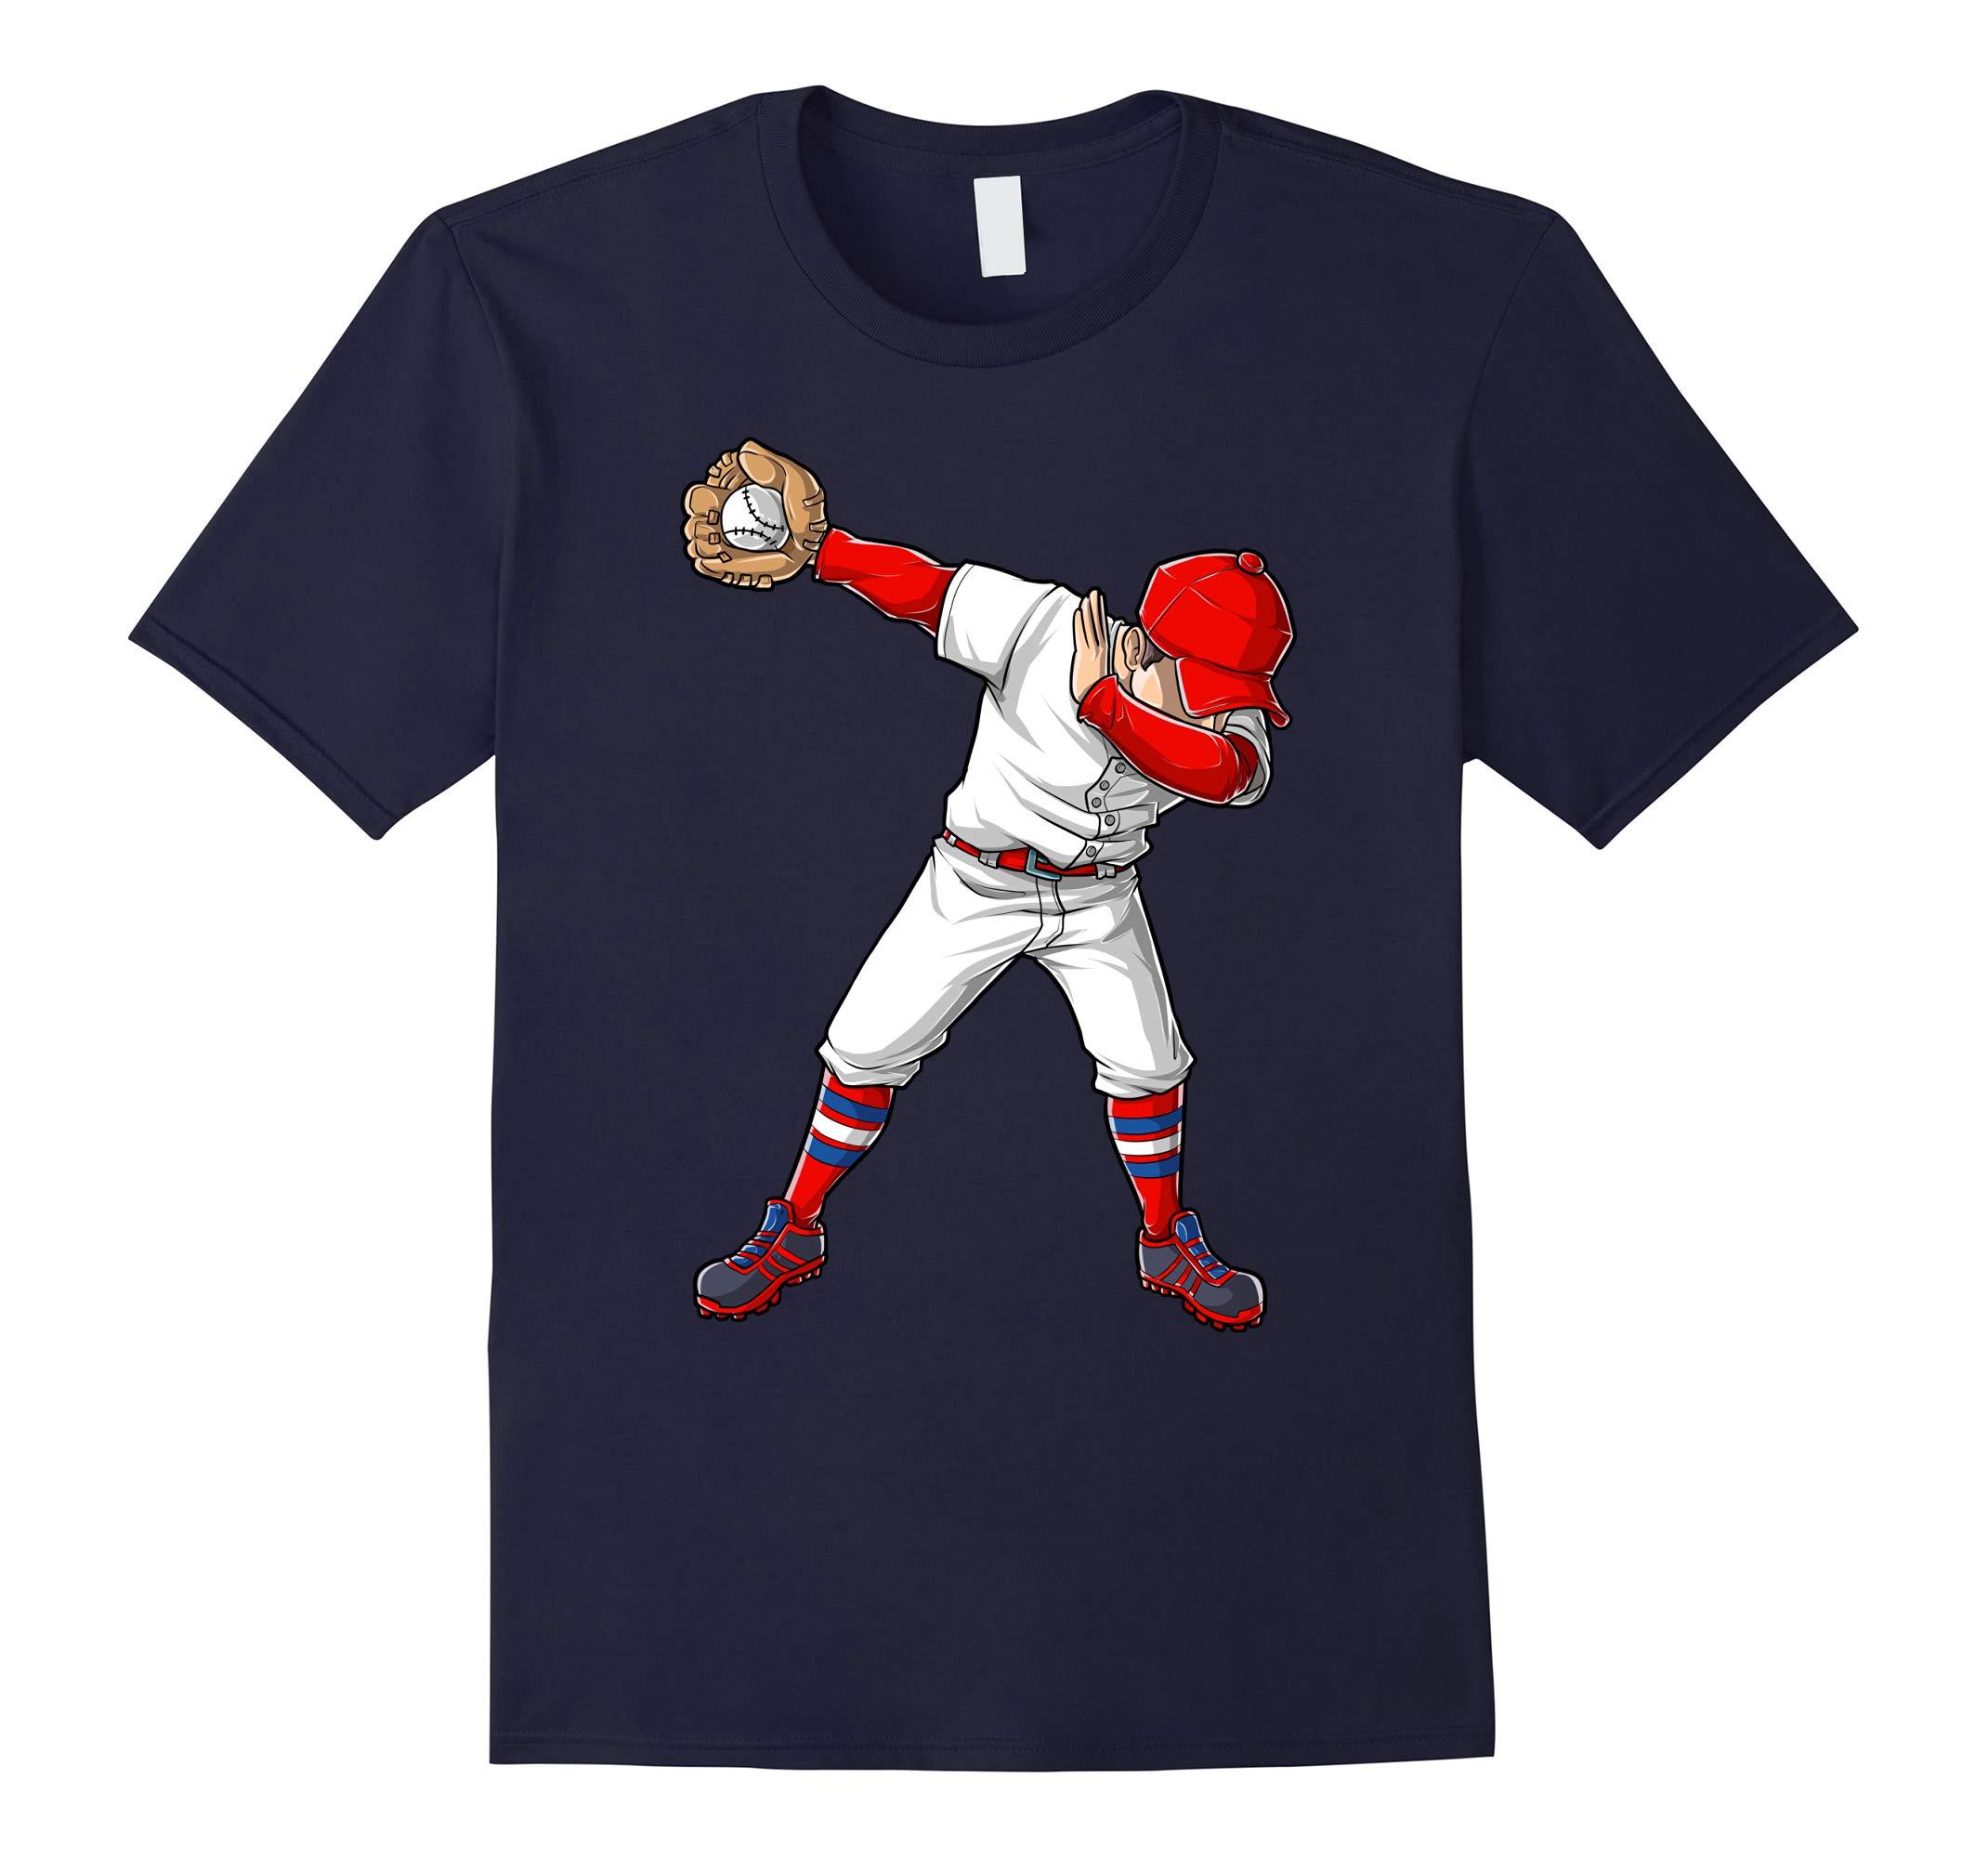 Baseball Dabbing T Shirt Funny Dab Dance Shirts Boys Girls-RT